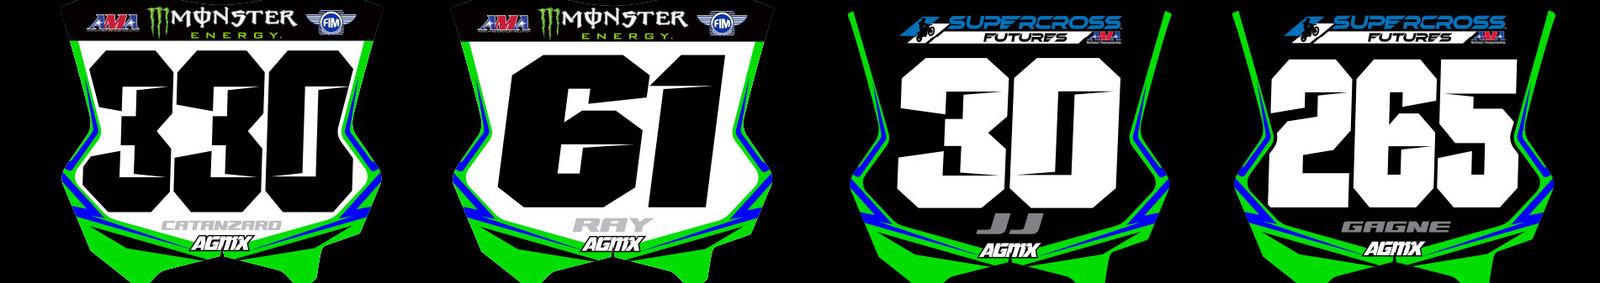 Maxxis to Sponsor SGB Racing/Maxxis/Babbitt's Kawasaki Race Team in 2020